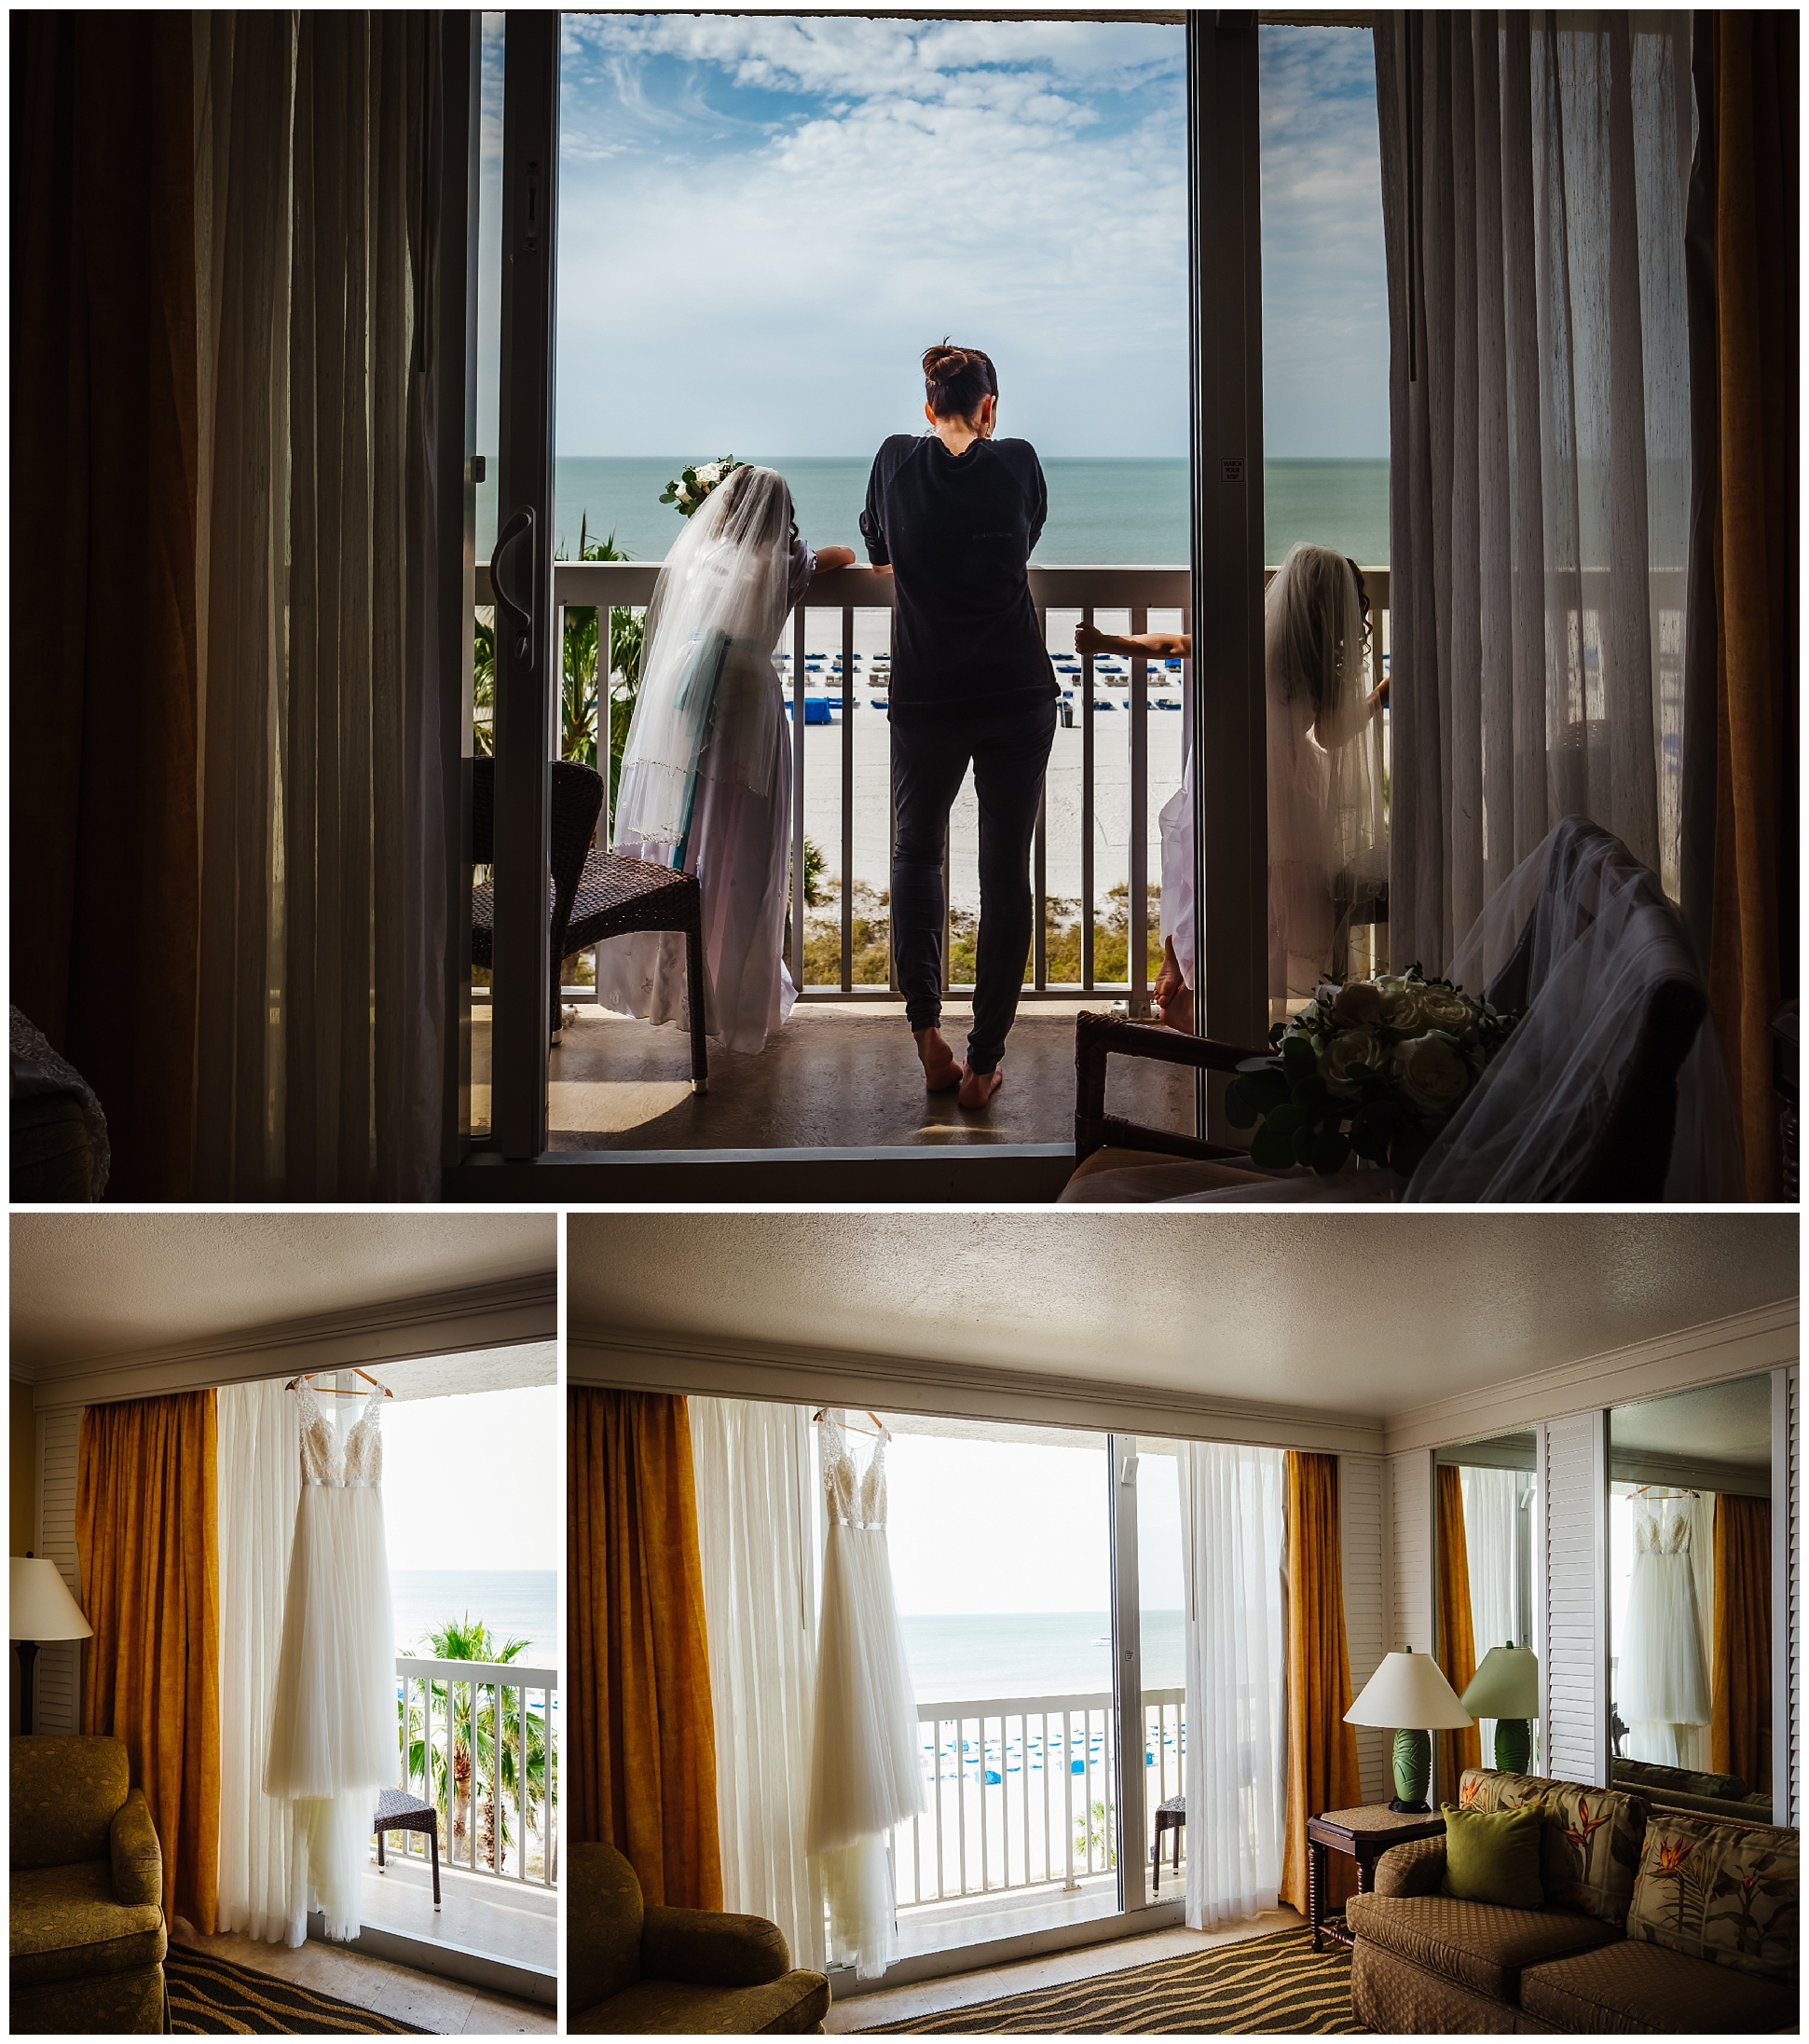 tampa-wedding-photographer-tradewinds-beach-family-elopement_0065.jpg